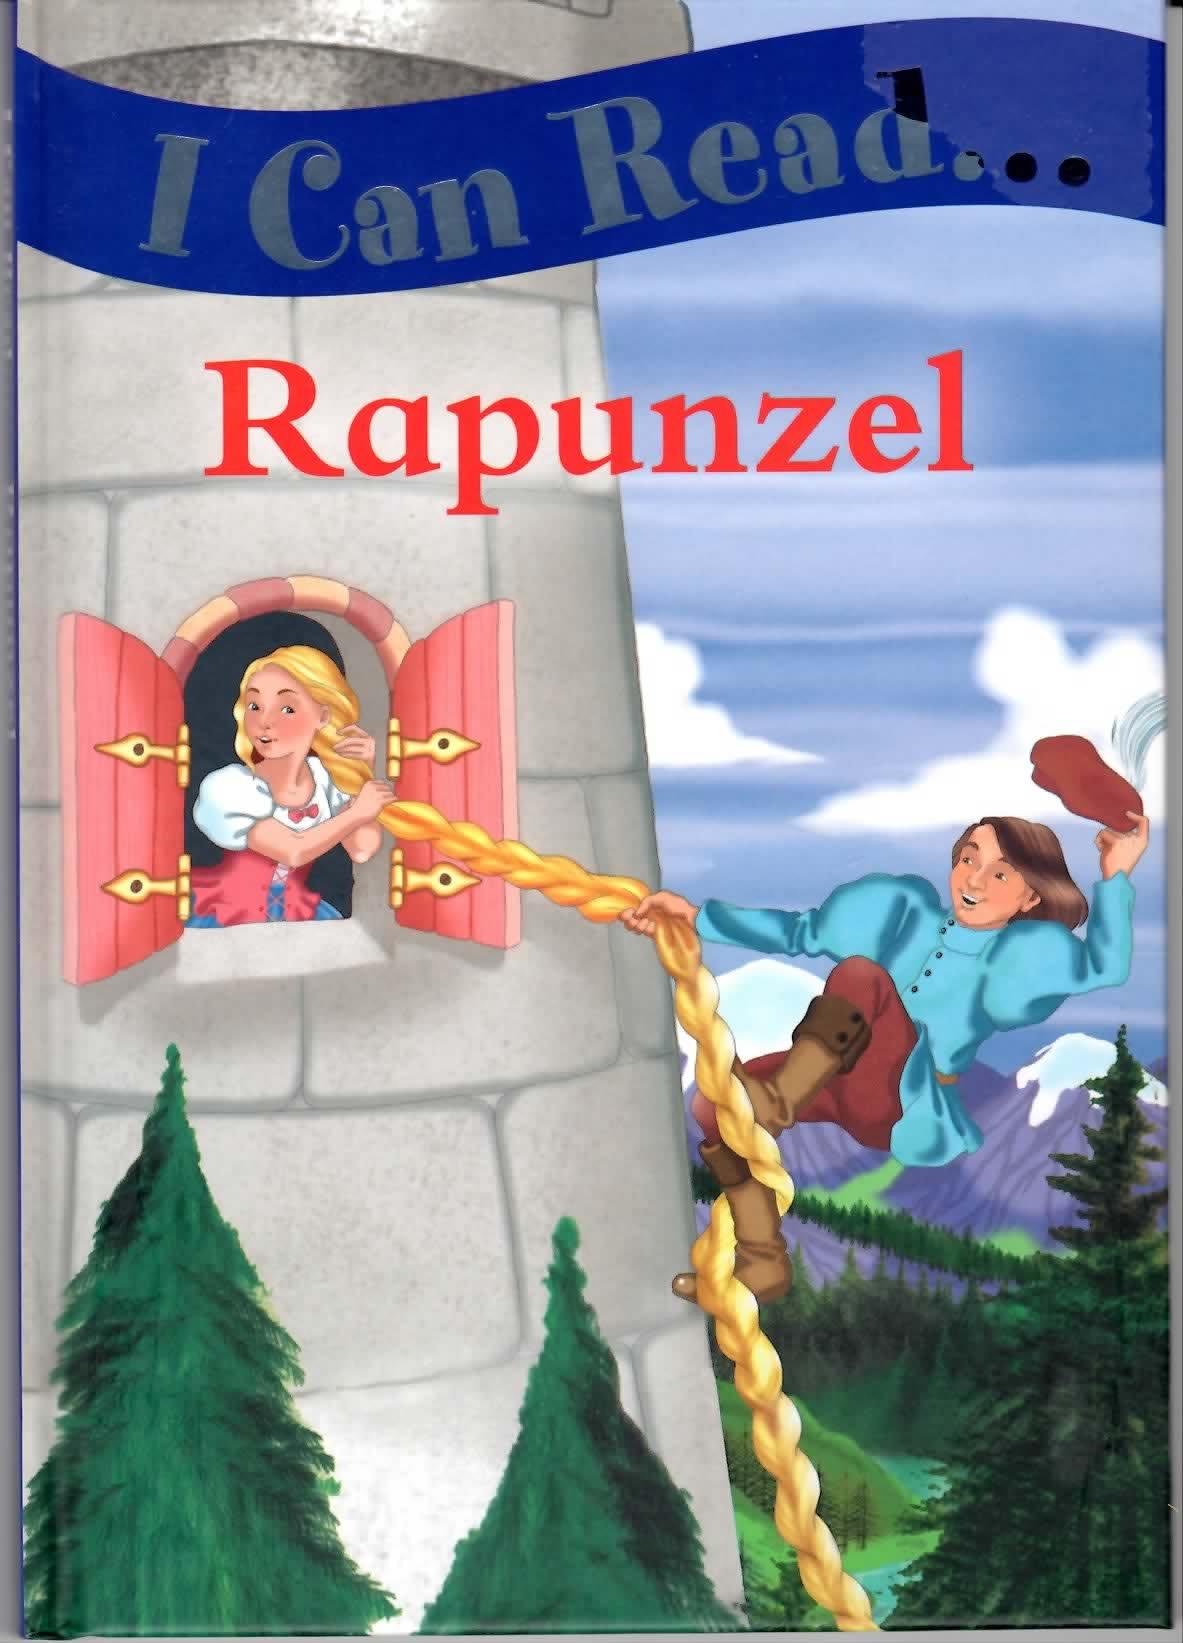 Rapunzel (I Can Read): Amazon.co.uk: Igloo Books Ltd: 9781848176249: Books